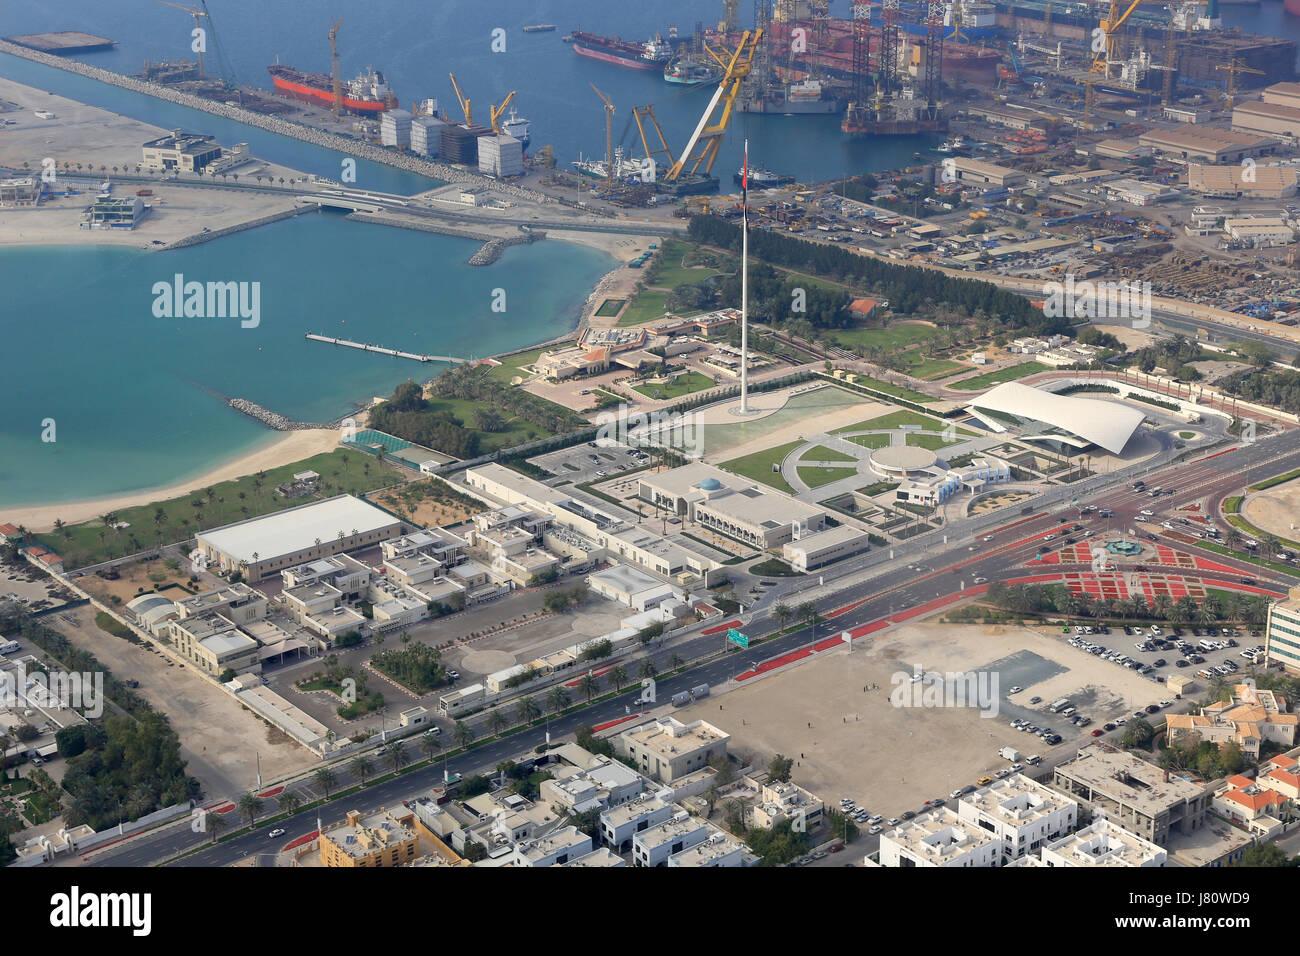 Dubai Union House Etihad Museum Jumeirah aerial view photography UAE - Stock Image